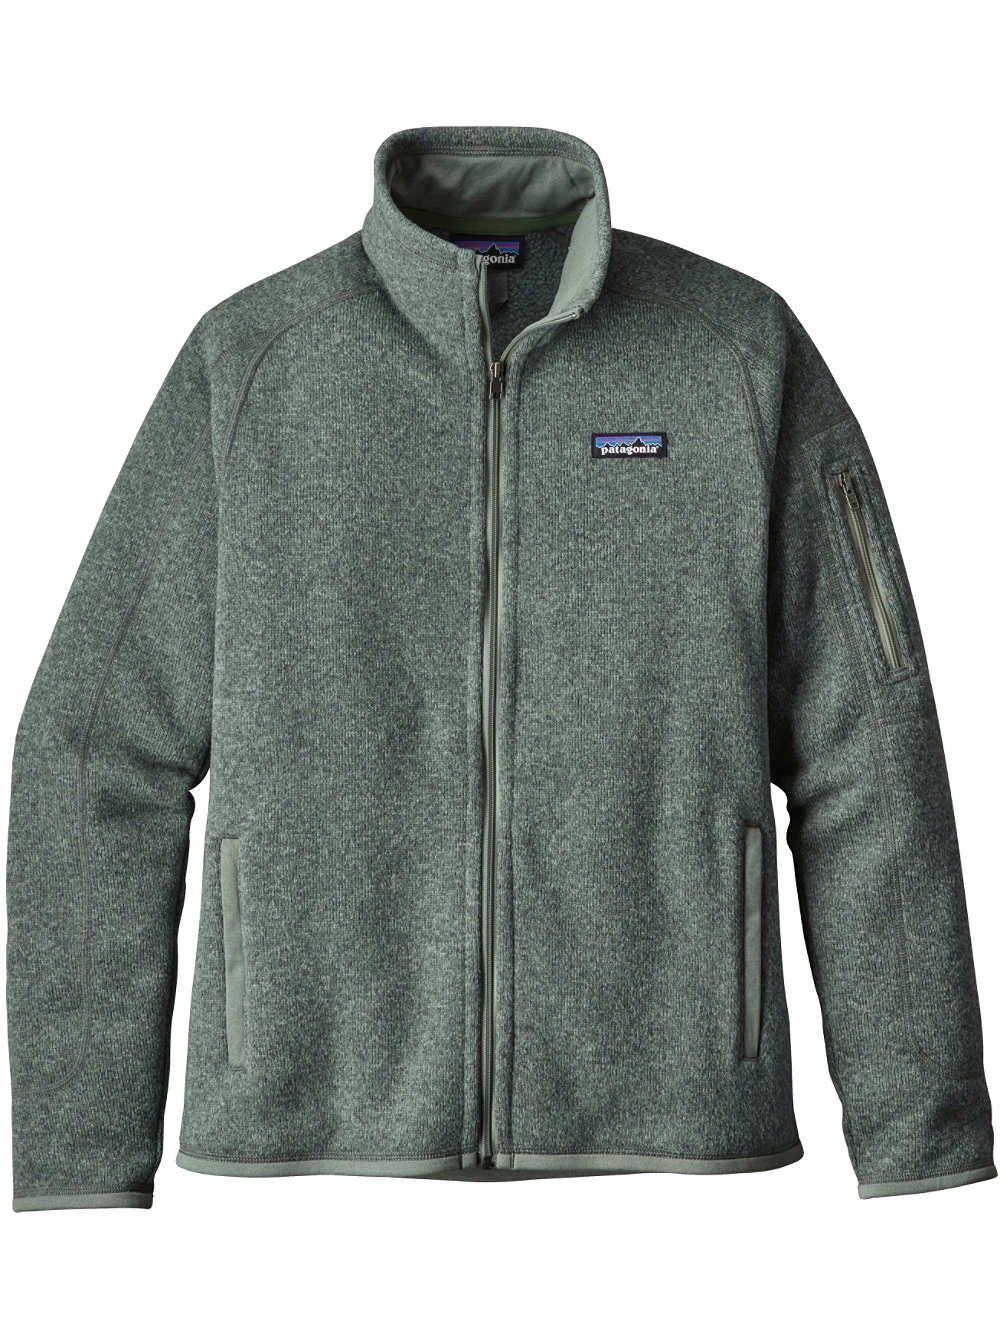 Patagonia Women Better Sweater Jacket - Hemlock Green (L) by Patagonia (Image #1)